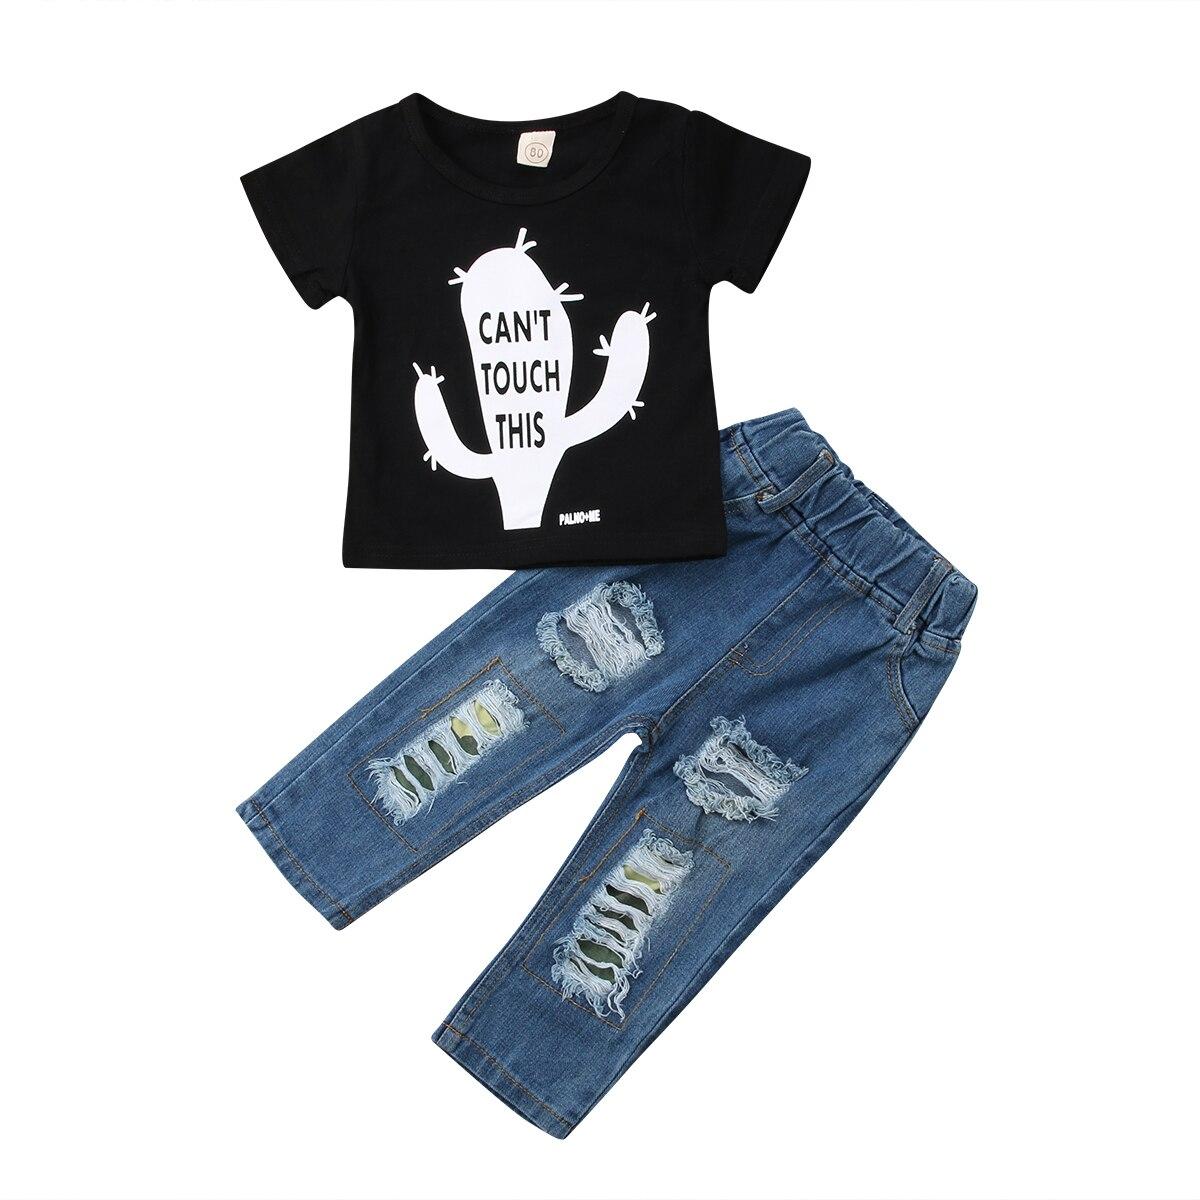 Boys T-Shirt Tops Short Sleeve Cotton Denim Ripped Hole Jeans Pants 2Pcs Toddler Kids Baby Boy Clothes Sets 6M-6T